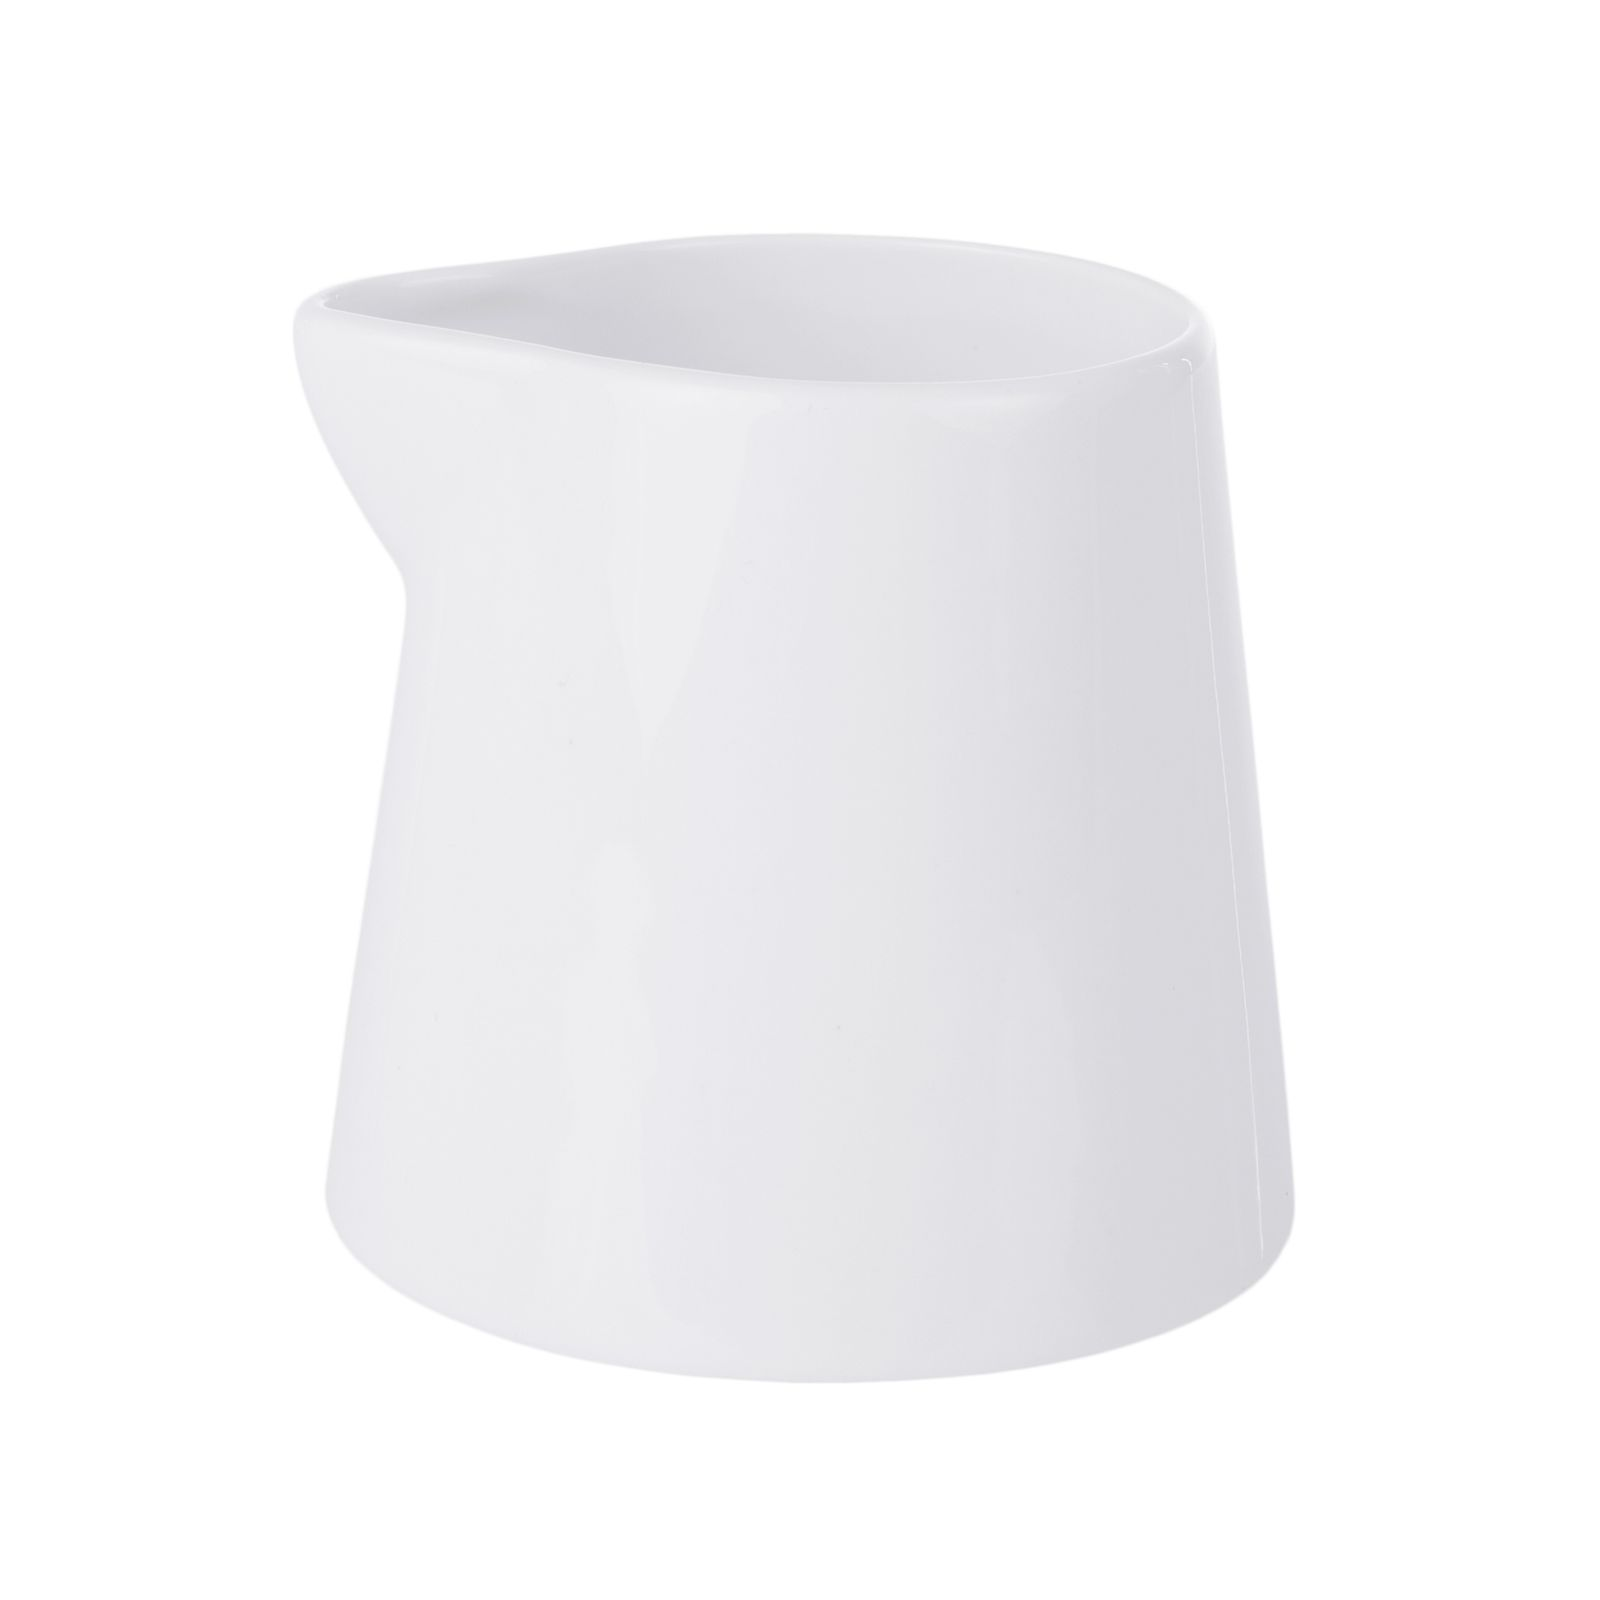 Milk jug Wave / Kubiko 130 ml AMBITION